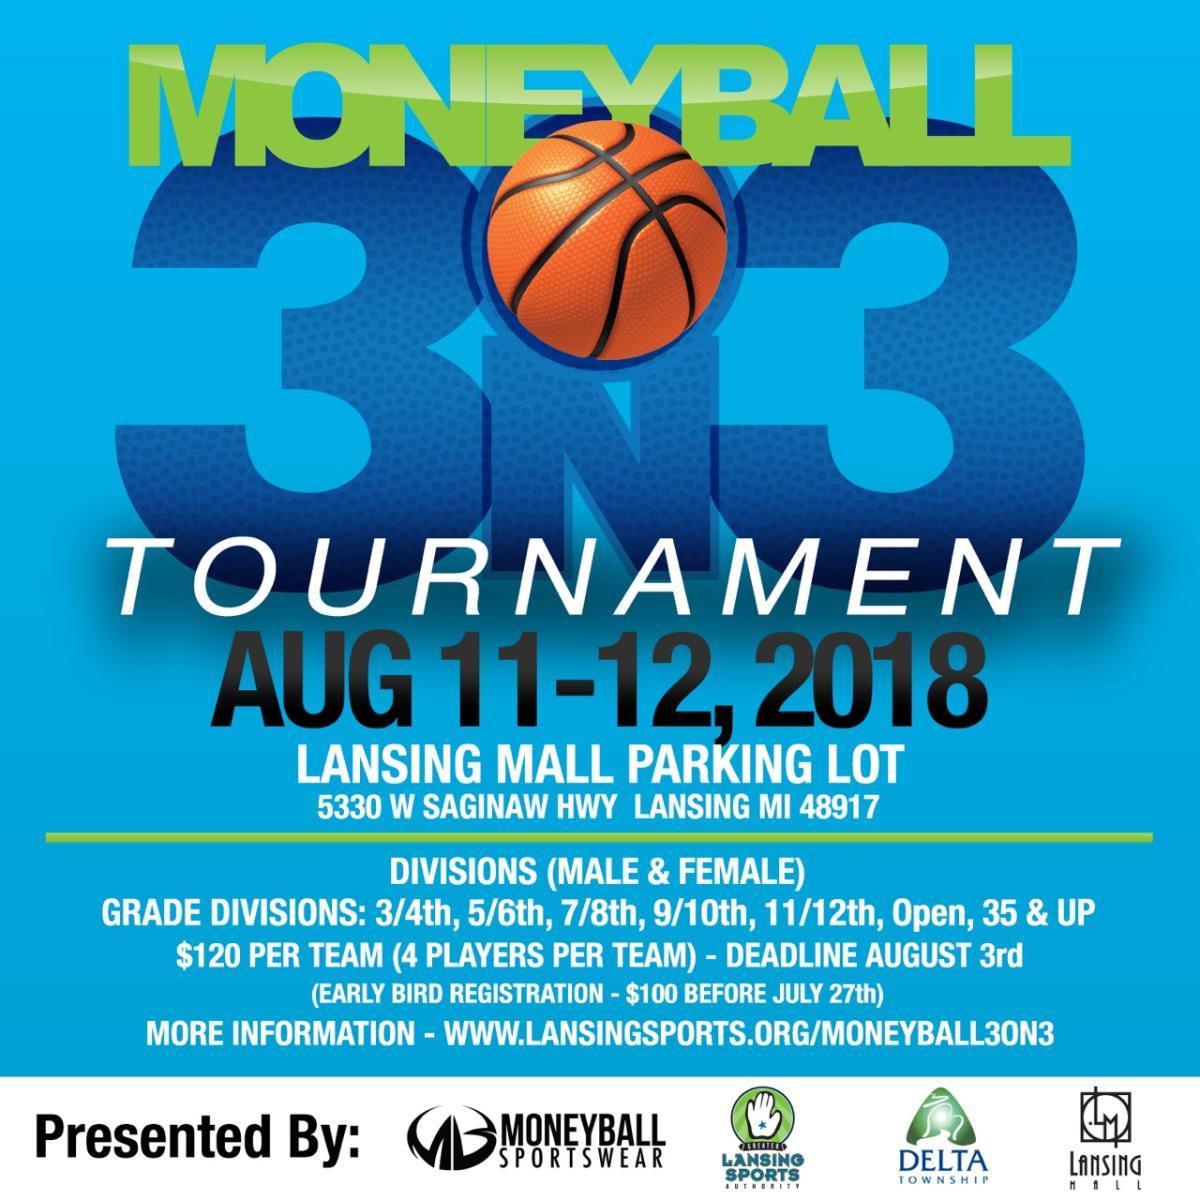 2018 Moneyball